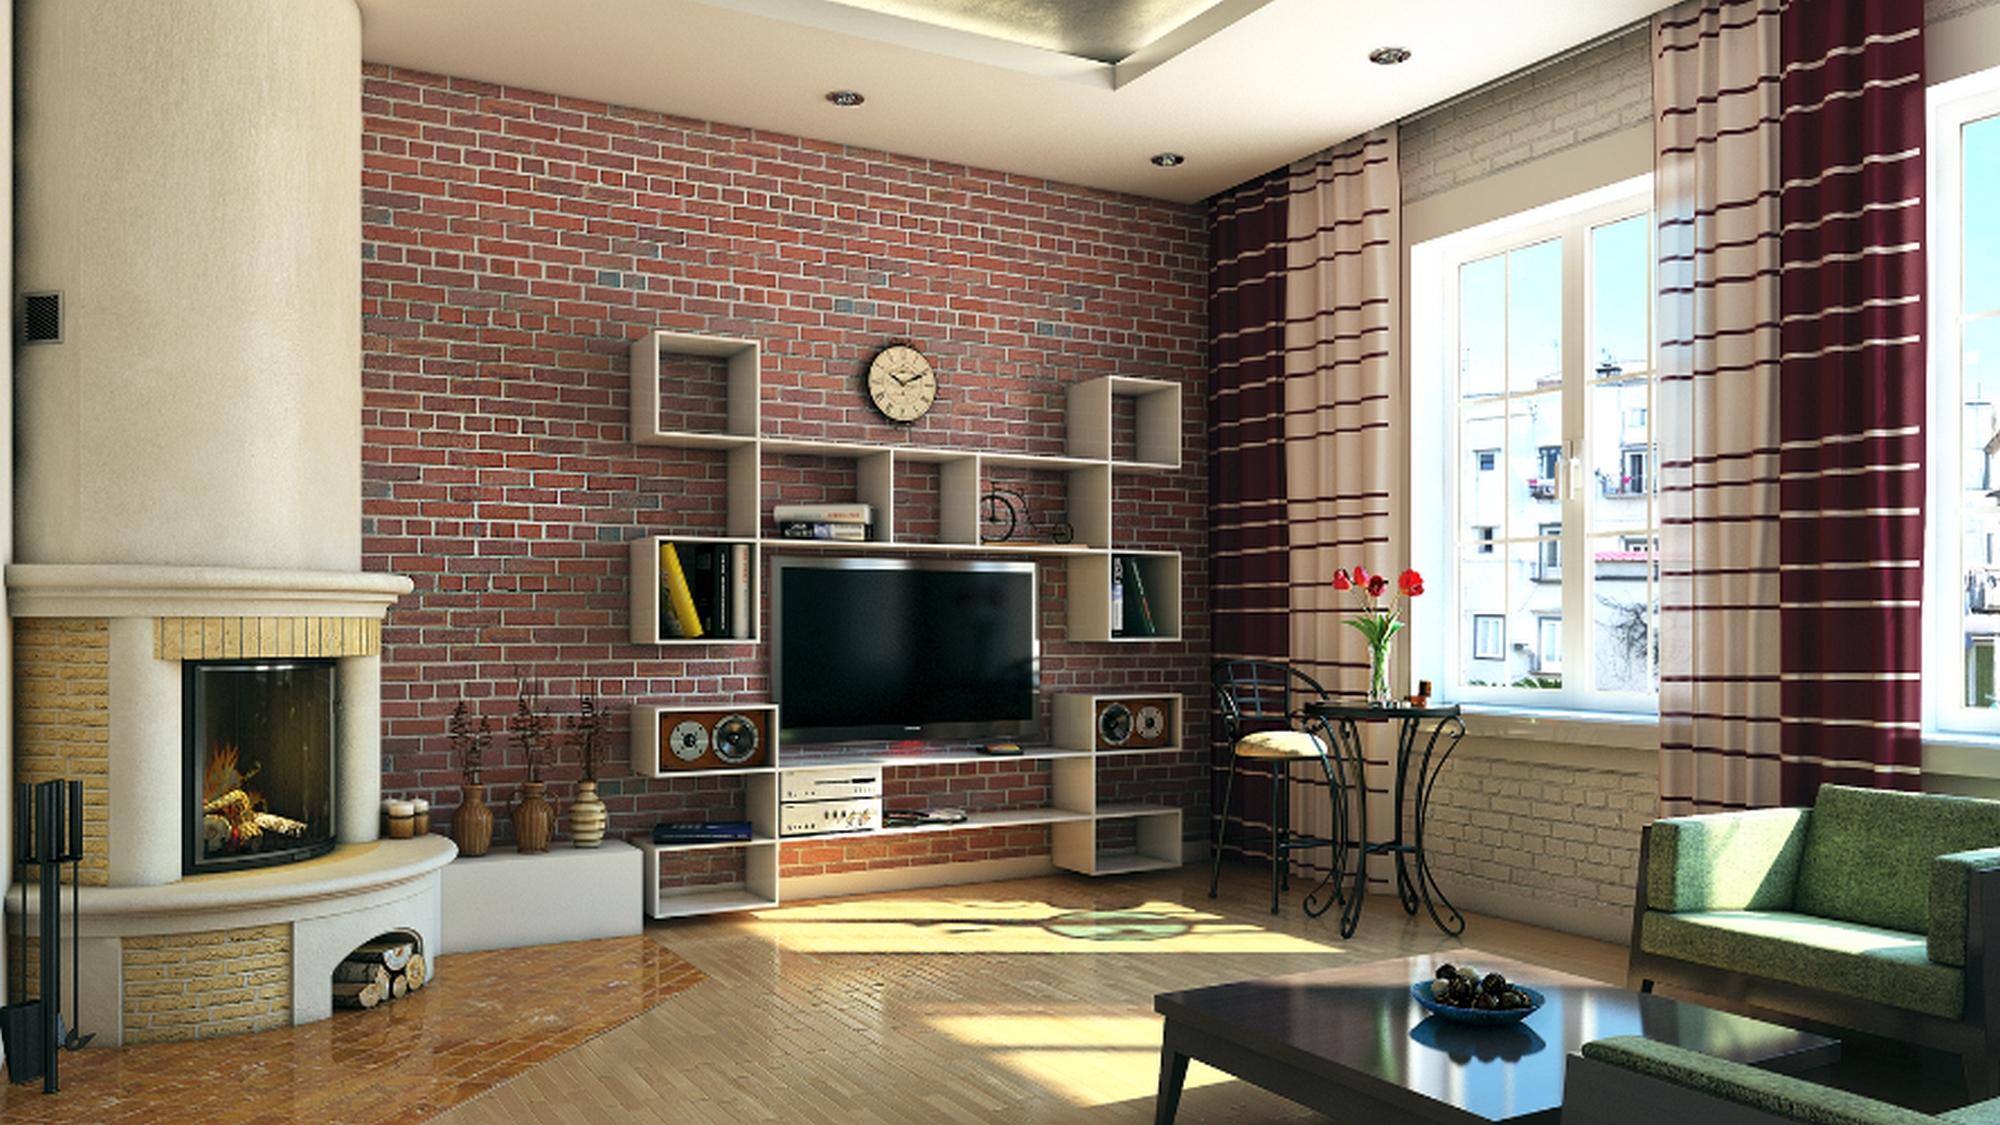 Kokybiškos 3D vizualizacijos | pro3d